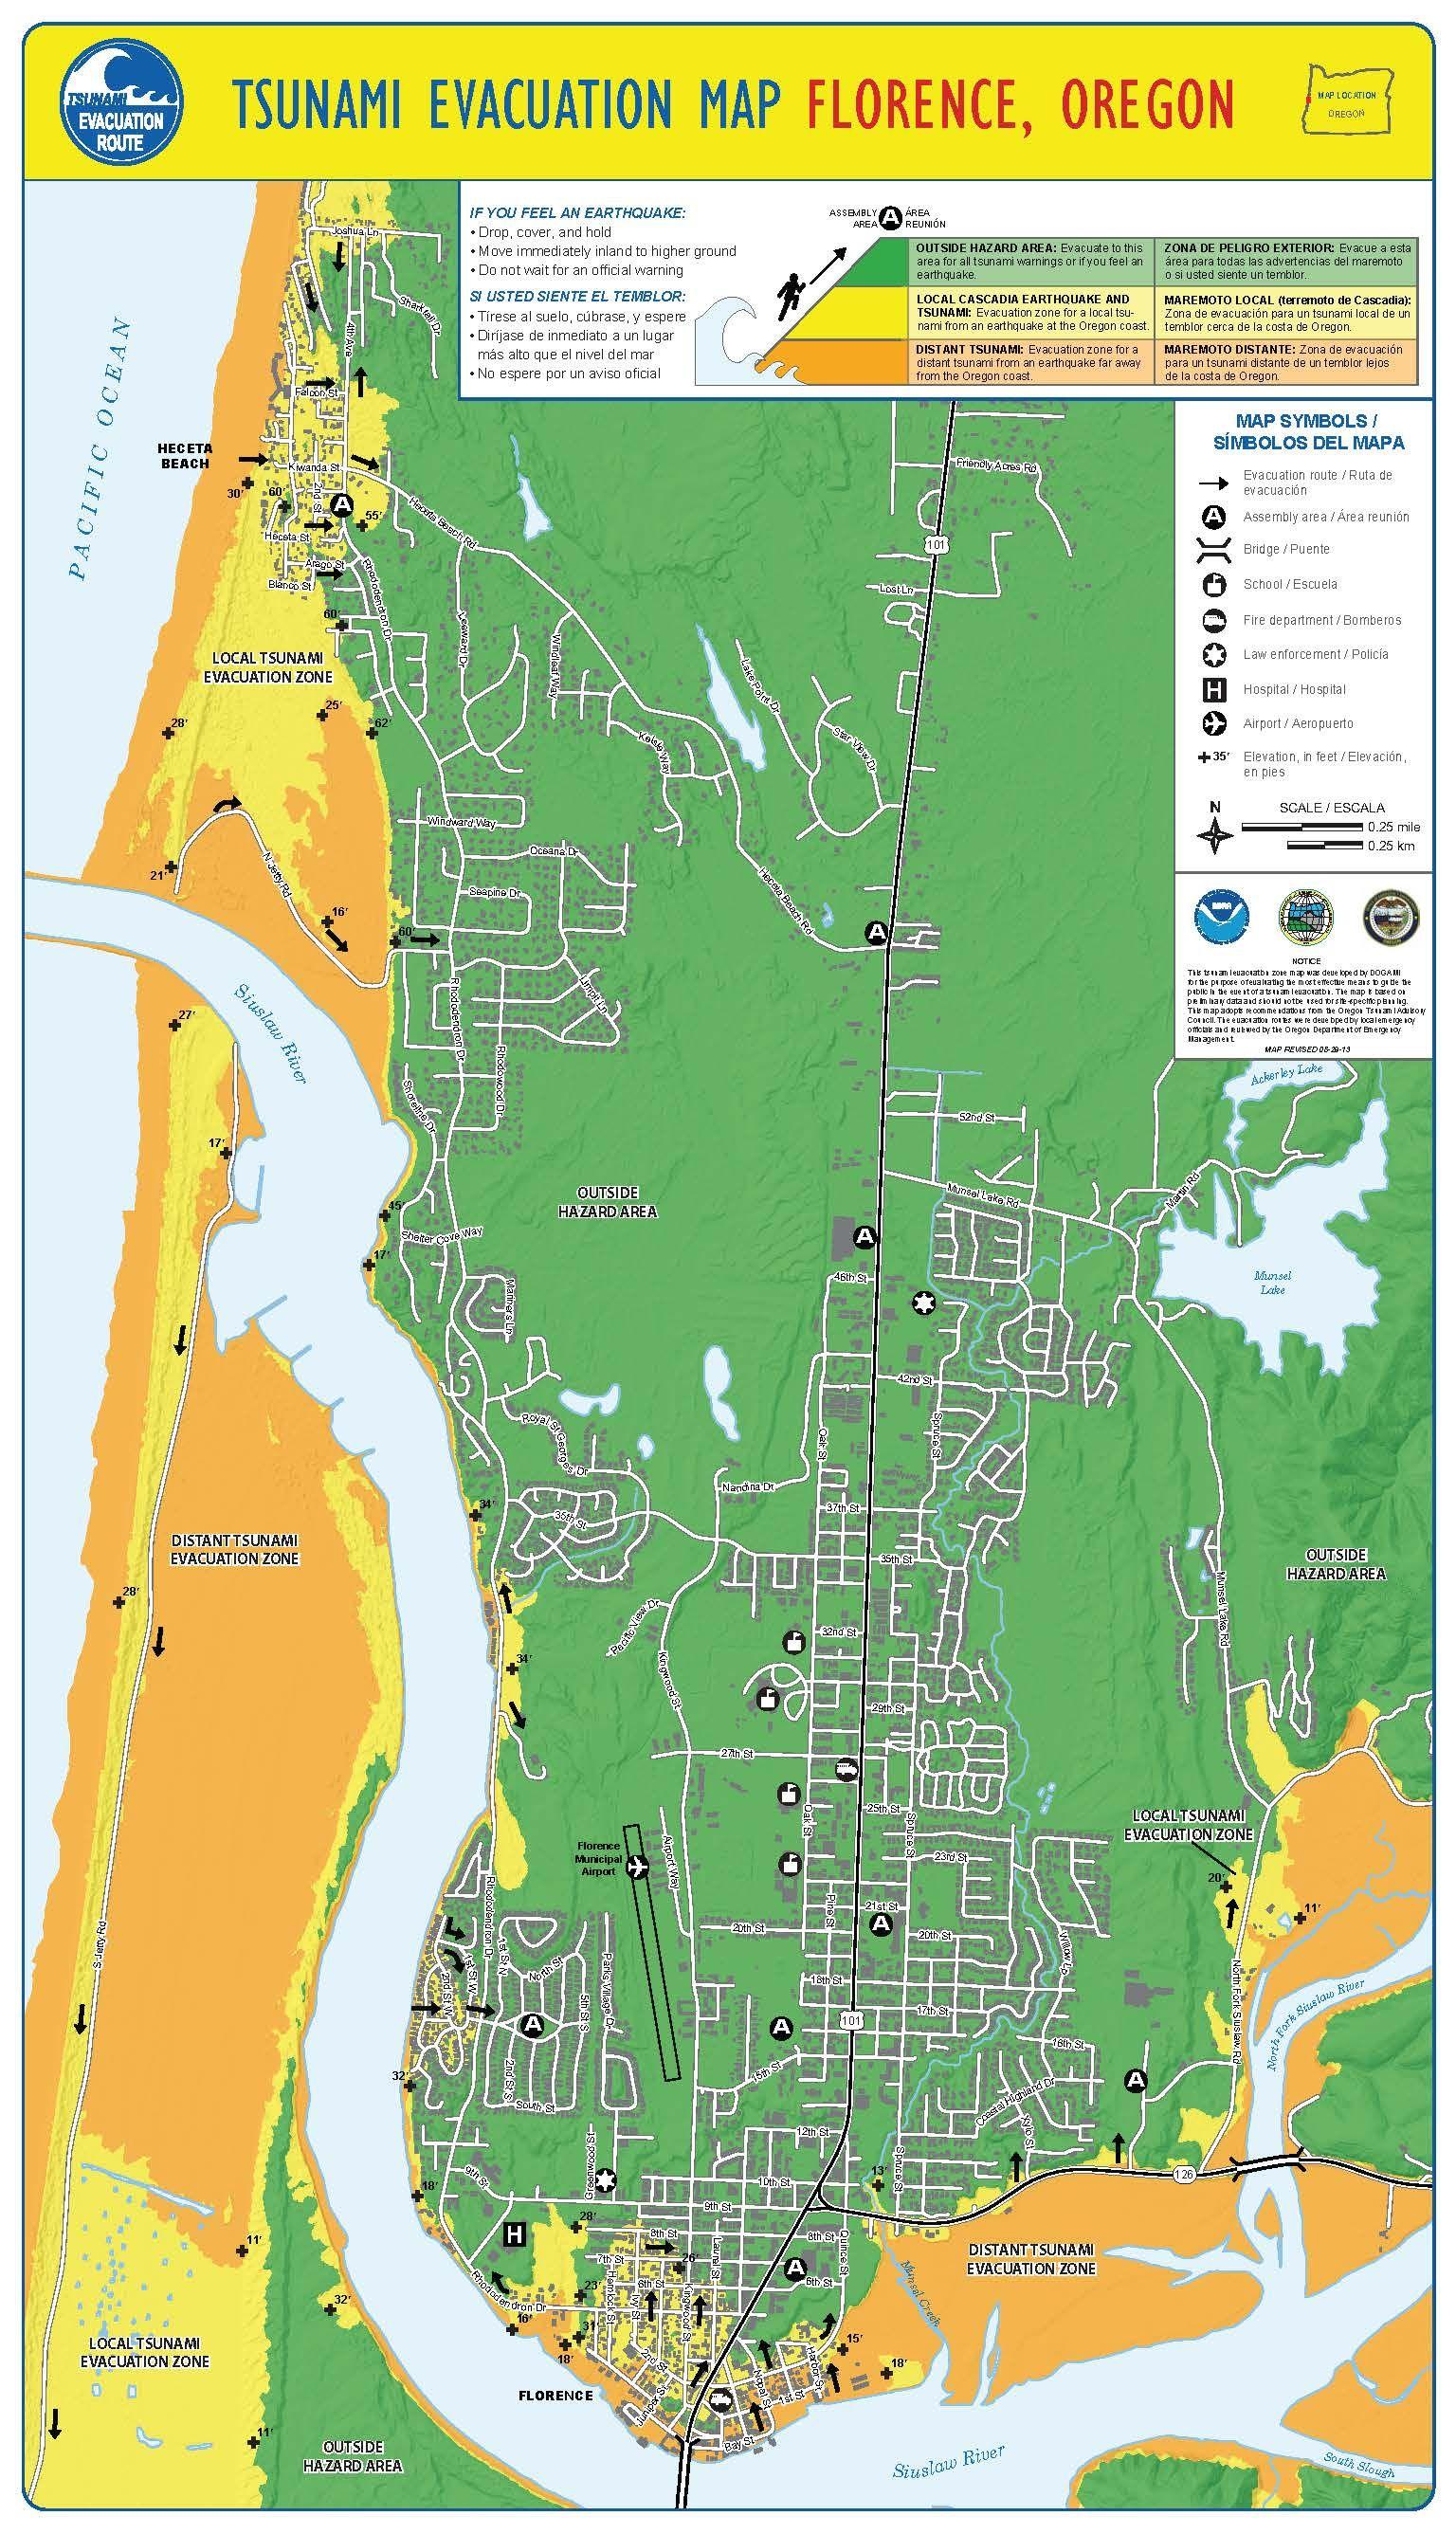 Tsunami evacuation map. Florence, Oregon, by the Oregon